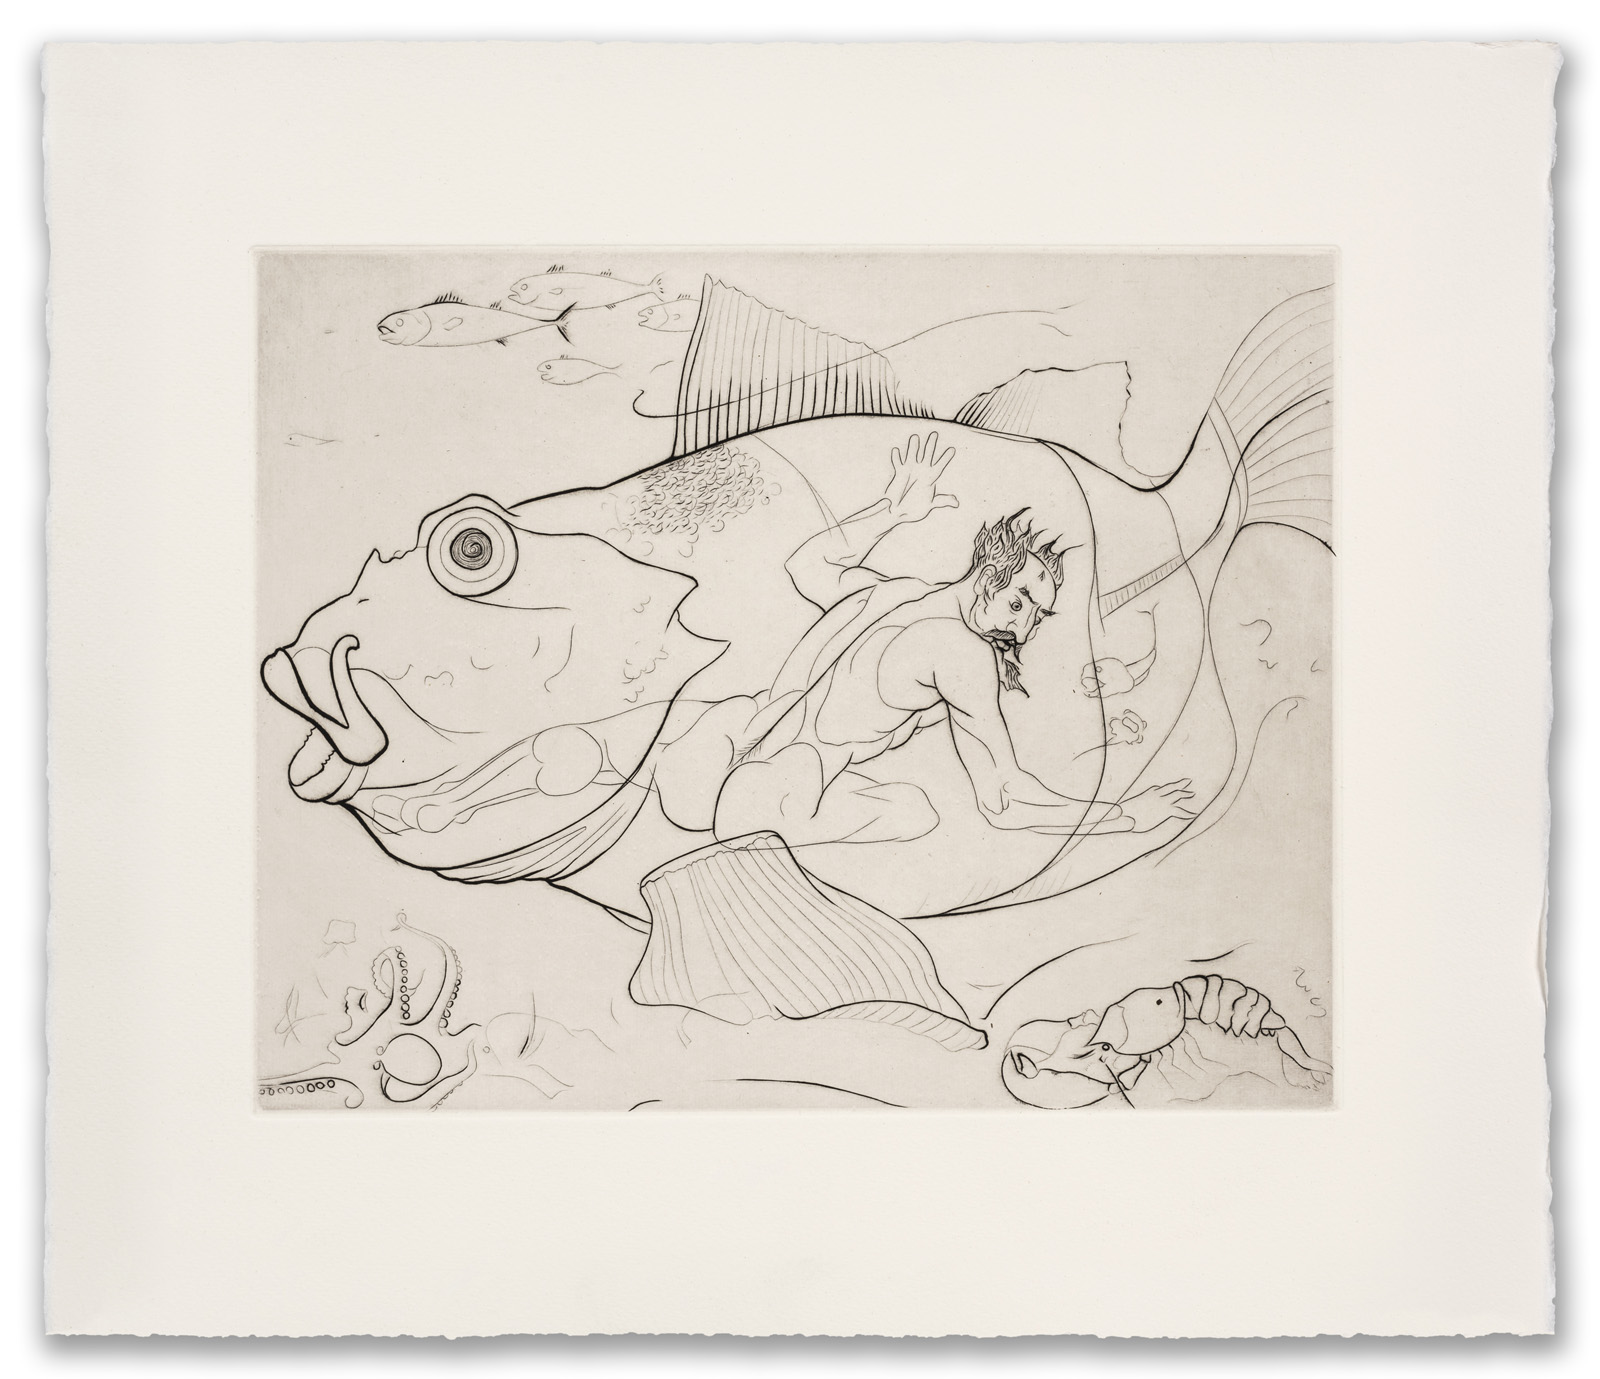 Francis West, (British 1936-2015), Jonah, c.1979 (2017 Edition).